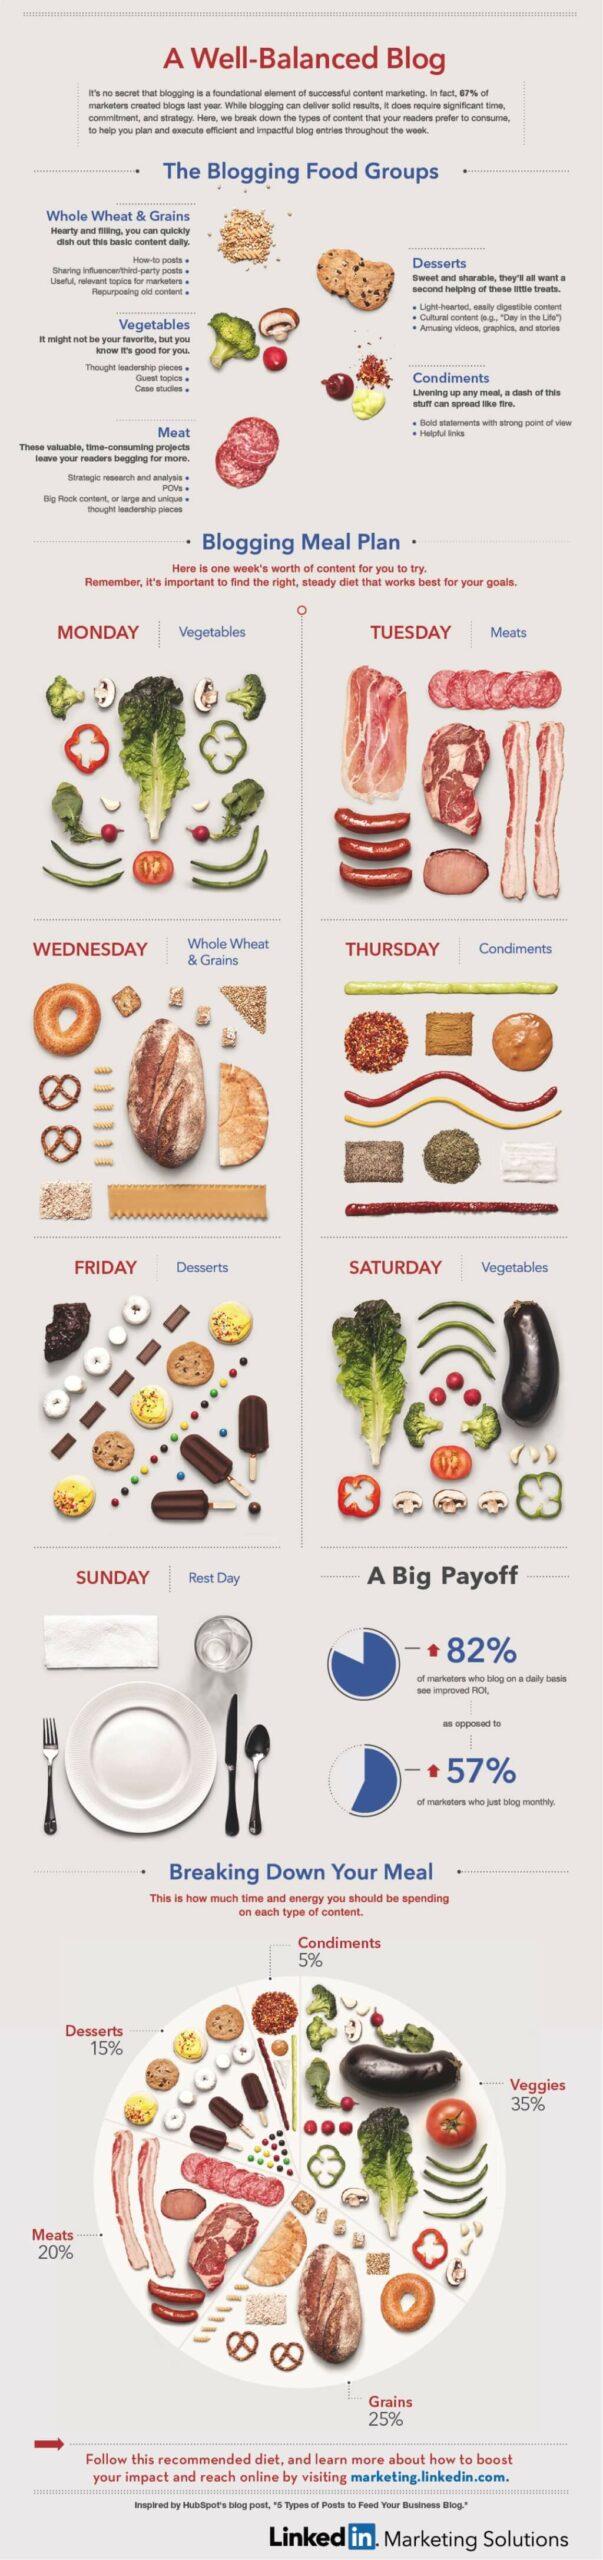 Infographic A Well-Balanced Blog